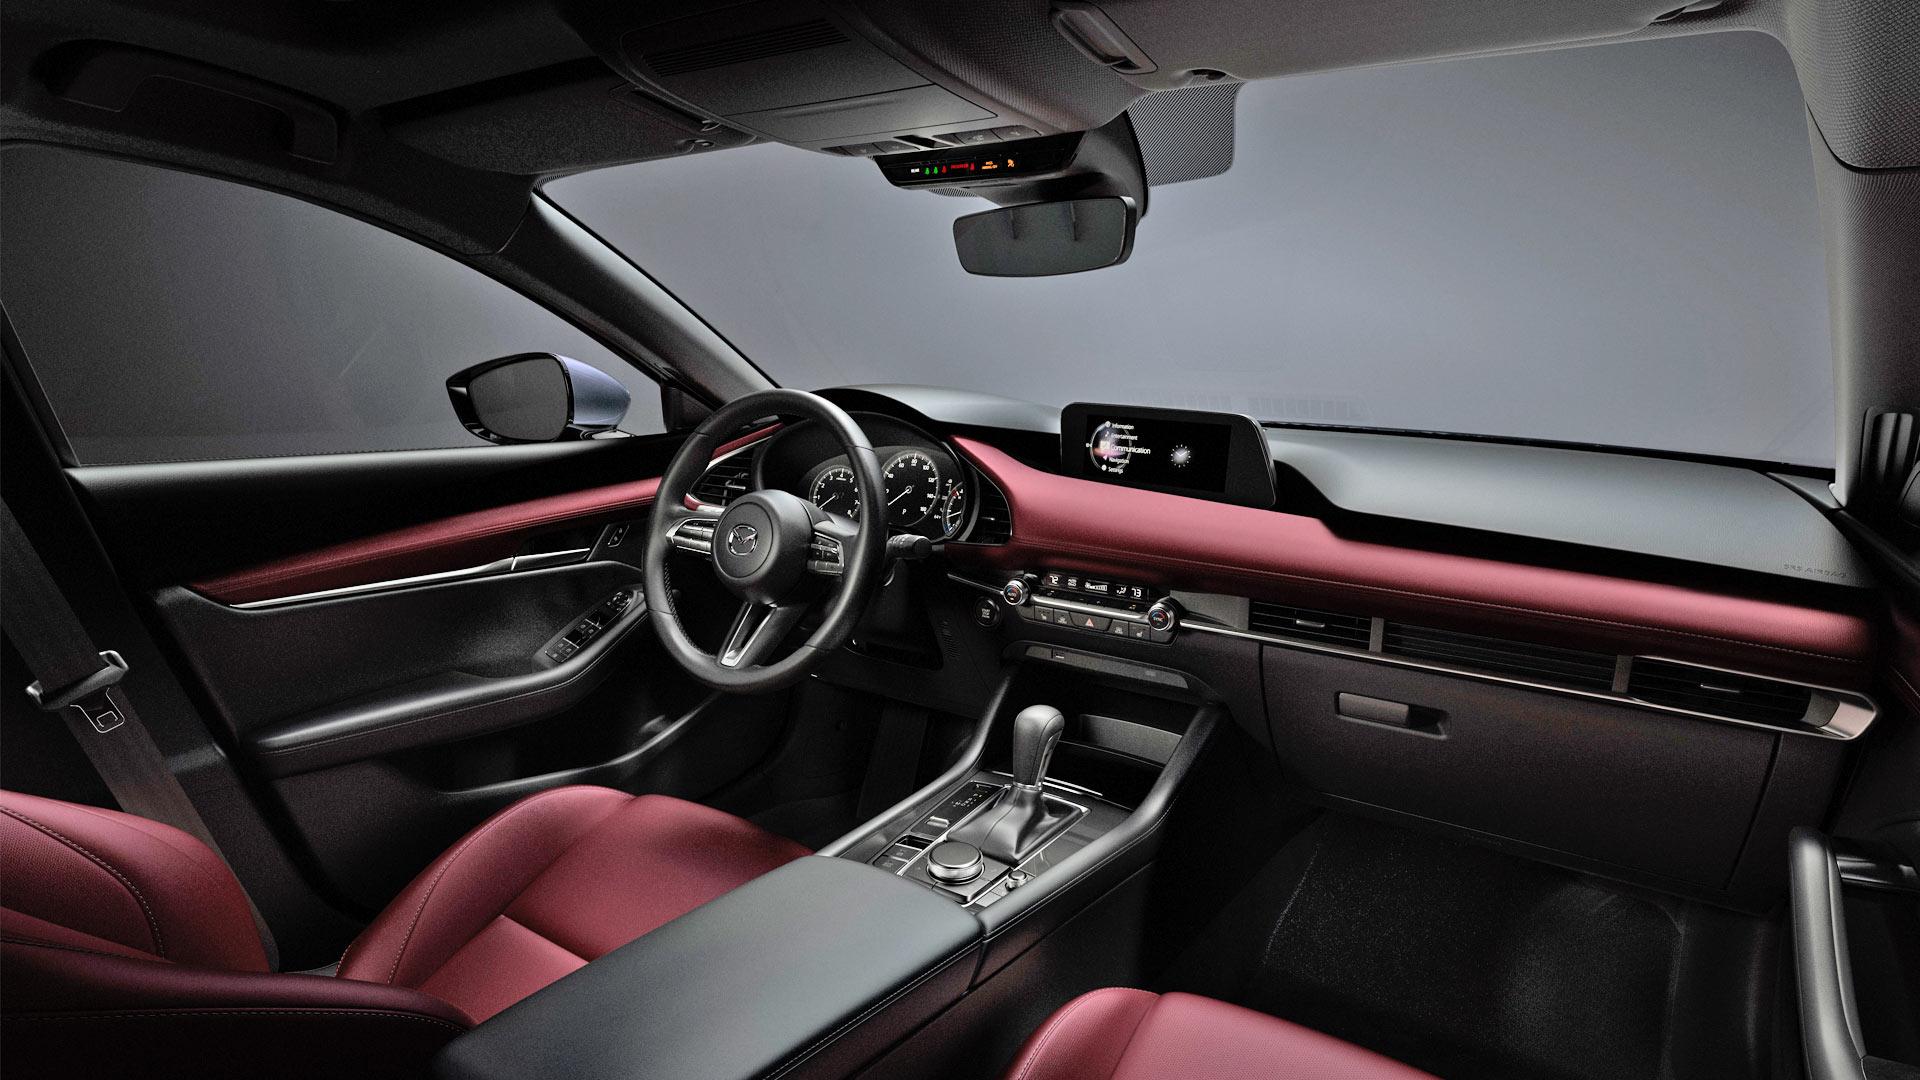 2019-Mazda-3-Interior-Burgundy